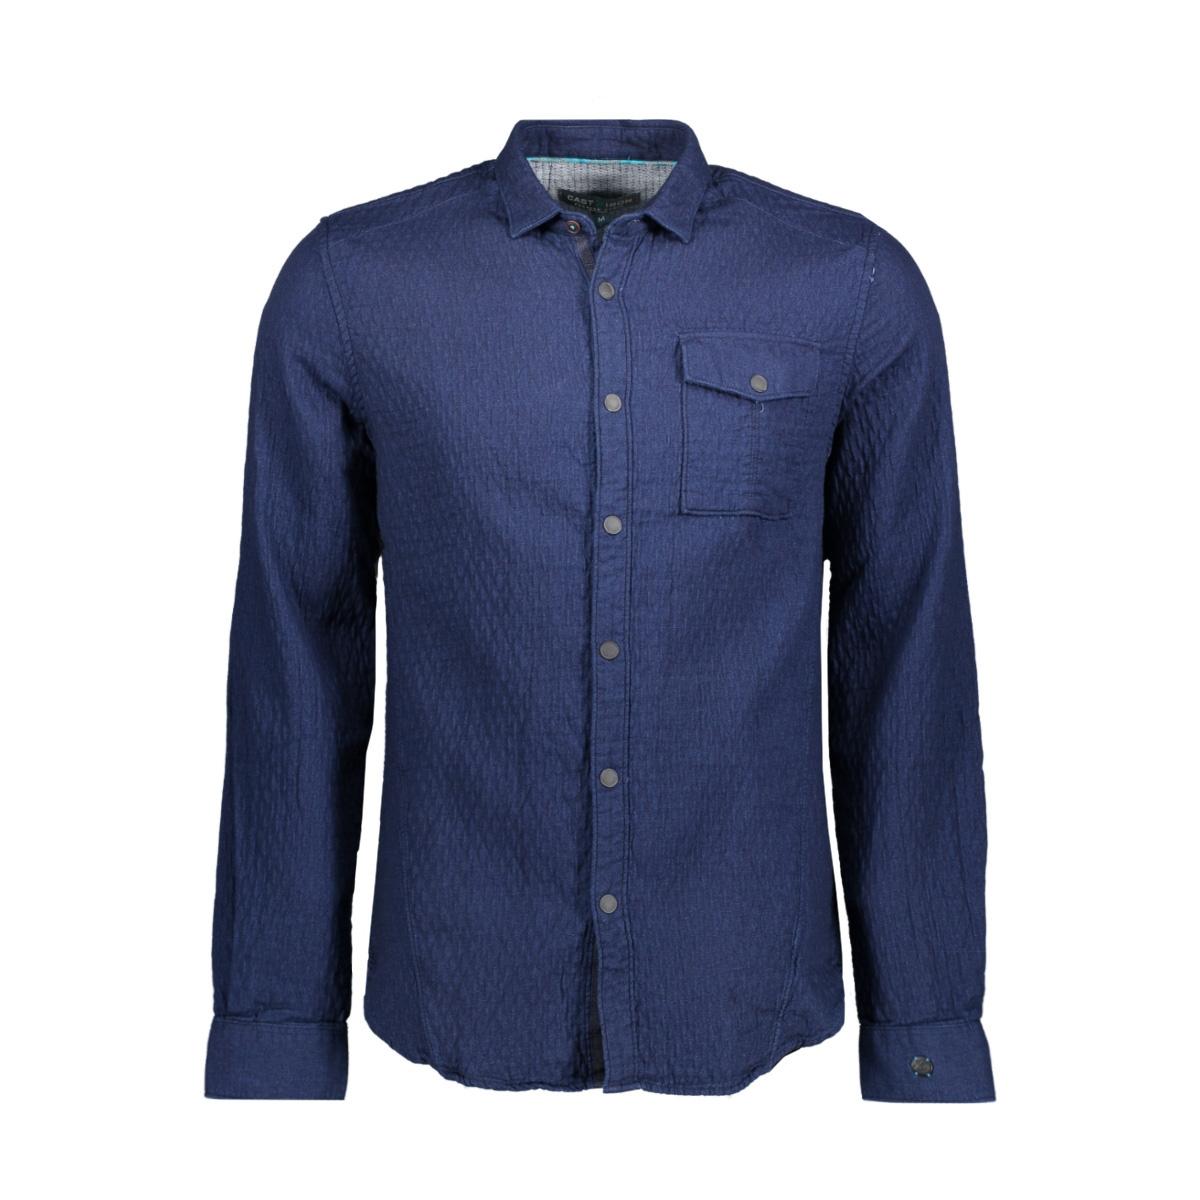 csi176616 cast iron overhemd 587